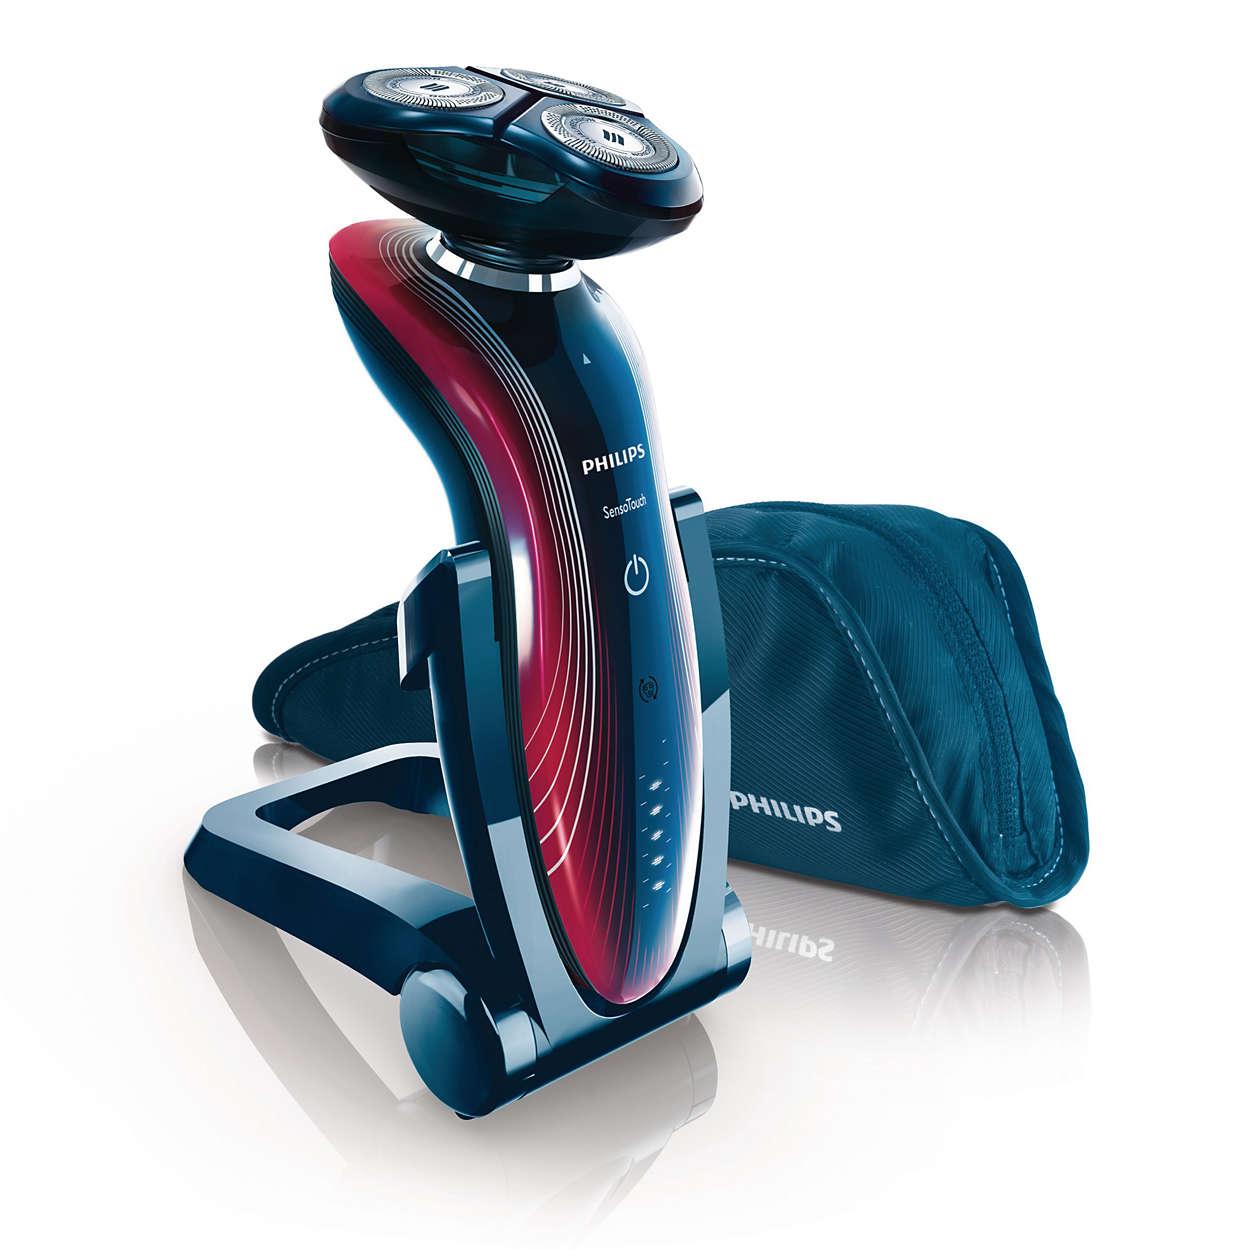 Philips SensoTouch - Resultado perfecto, afeitado suave